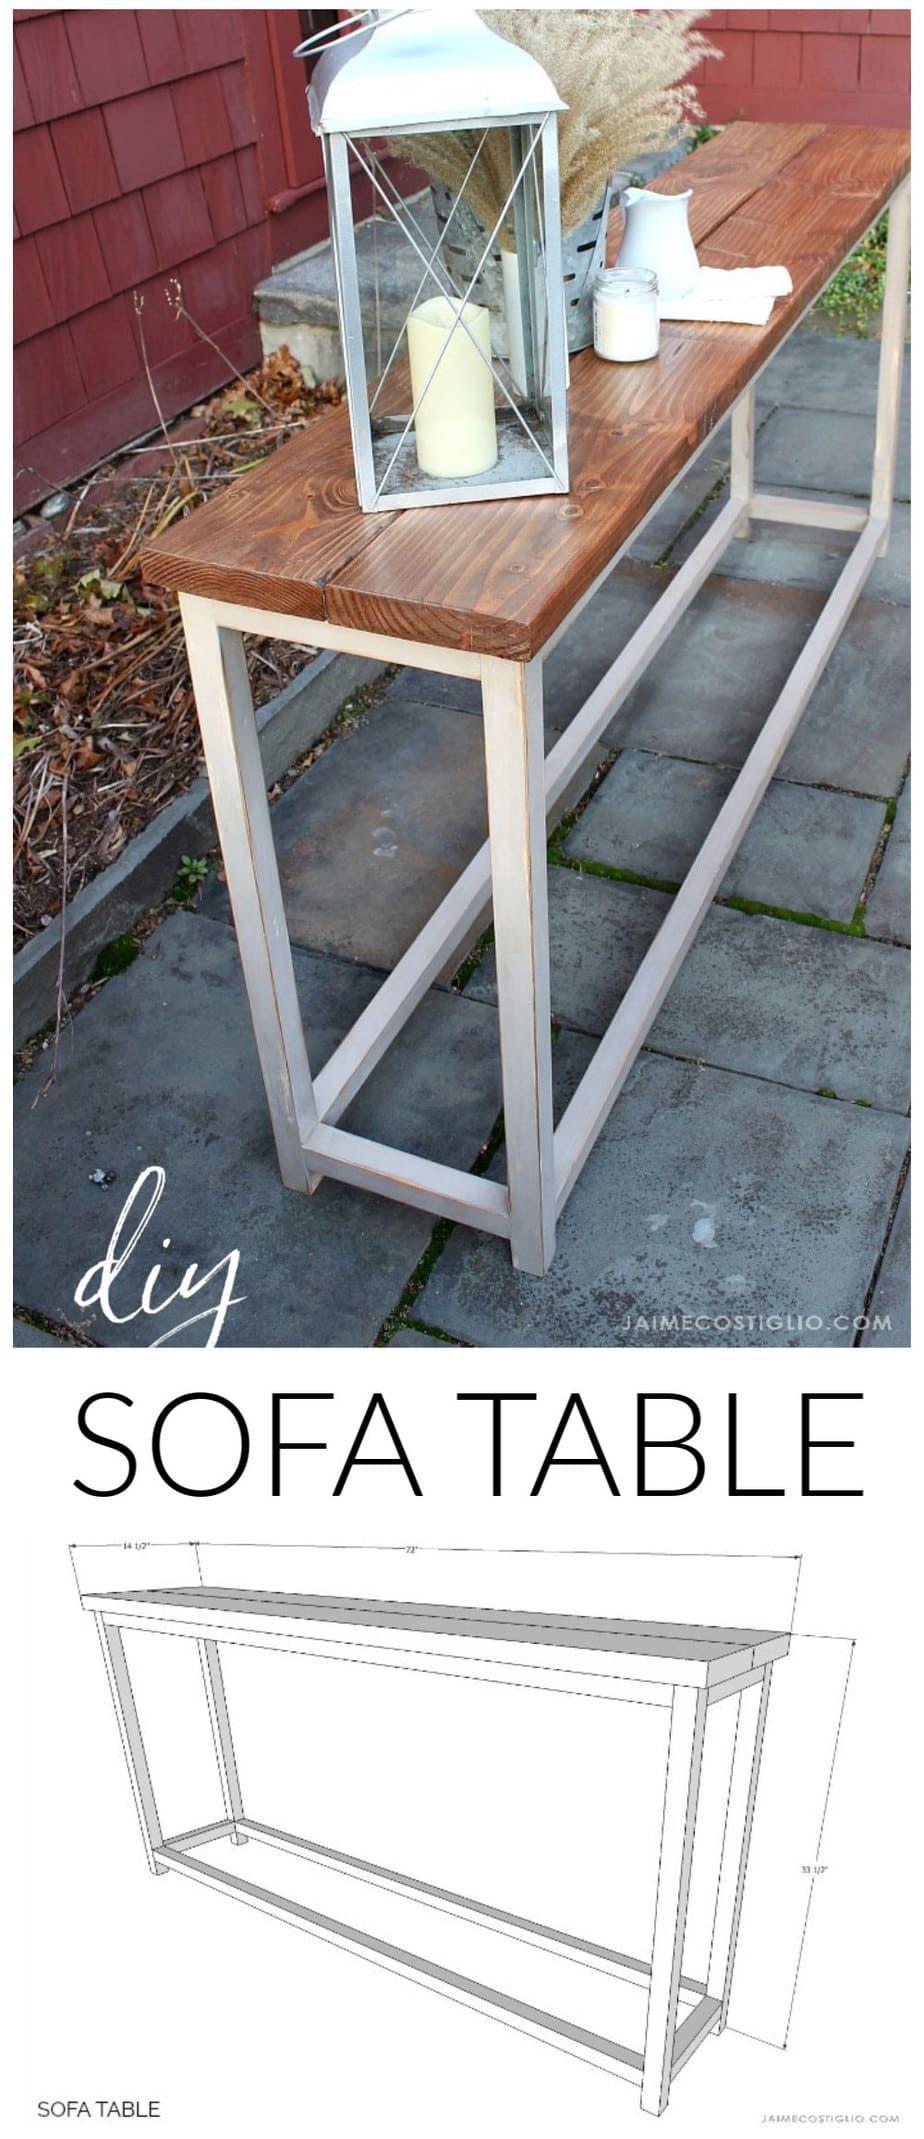 Simple Sofa Table Free Plans Jaime Costiglio In 2020 Simple